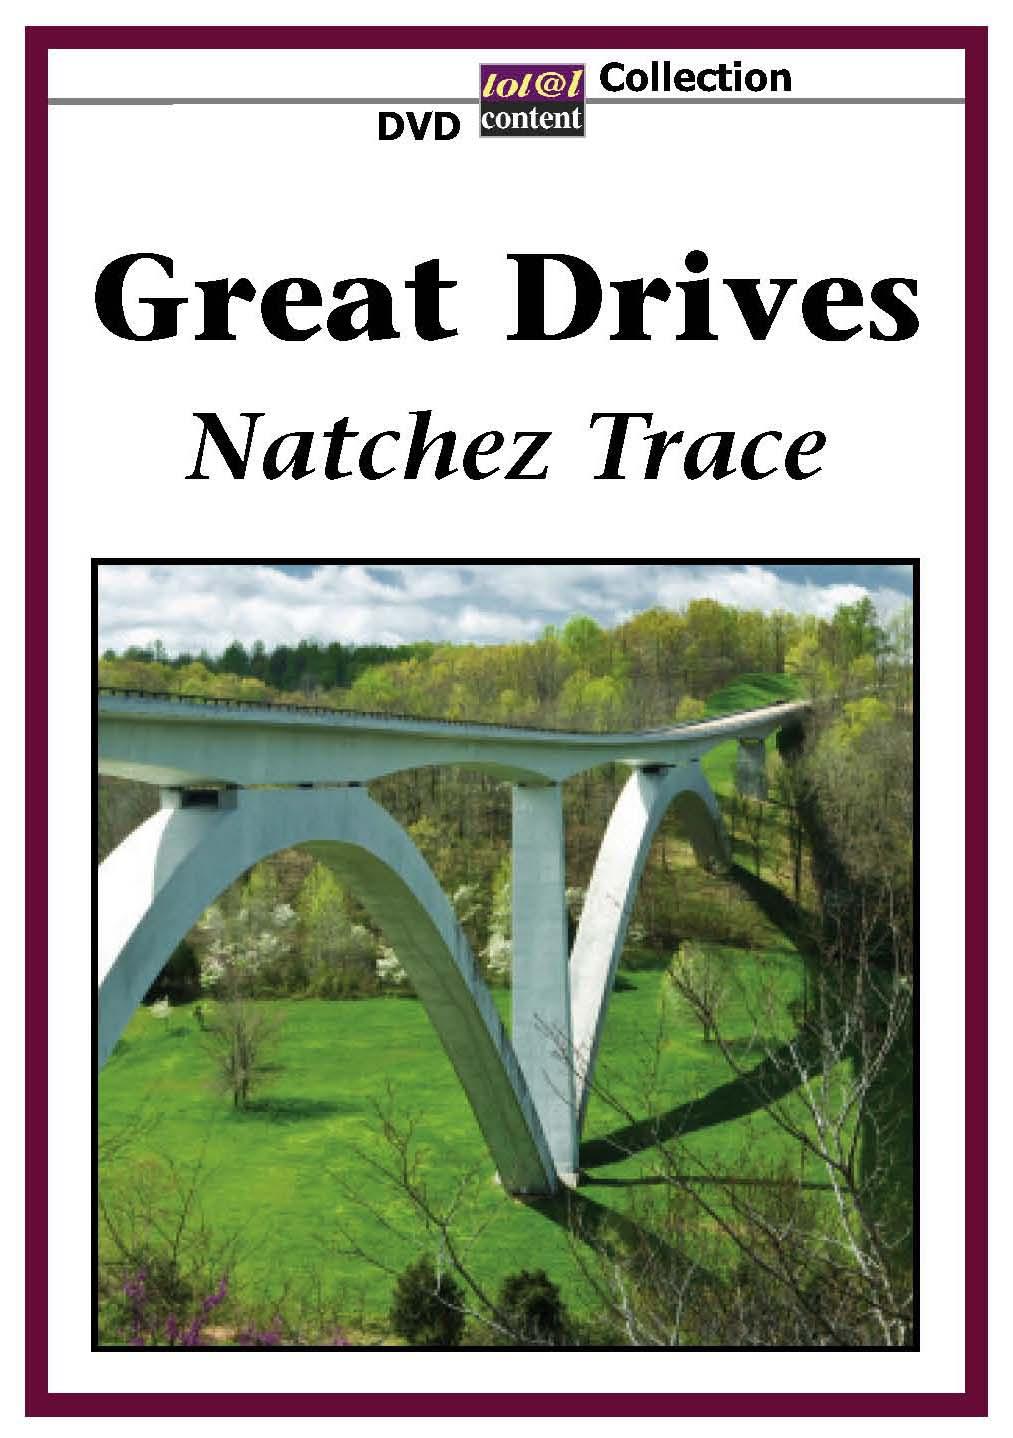 Great Drives: Natchez Trace